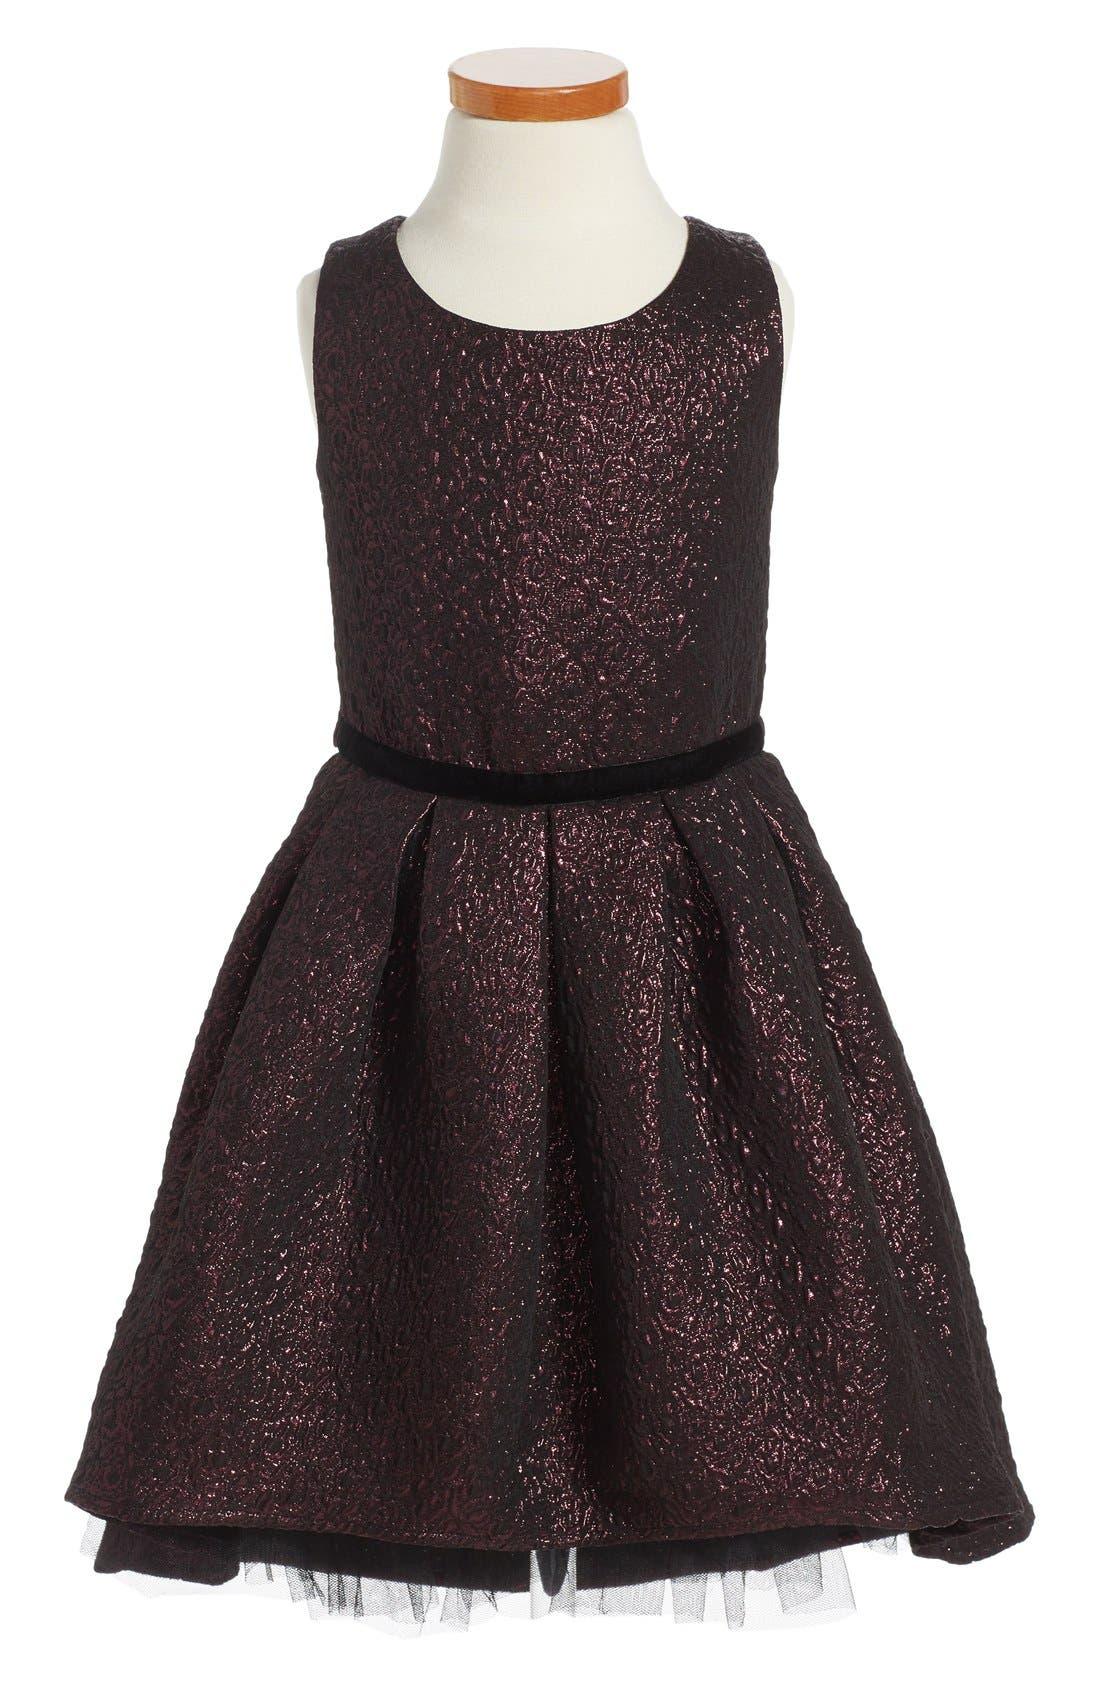 Main Image - Zunie Brocade Fit & Flare Dress (Toddler Girls, Little Girls & Big Girls)